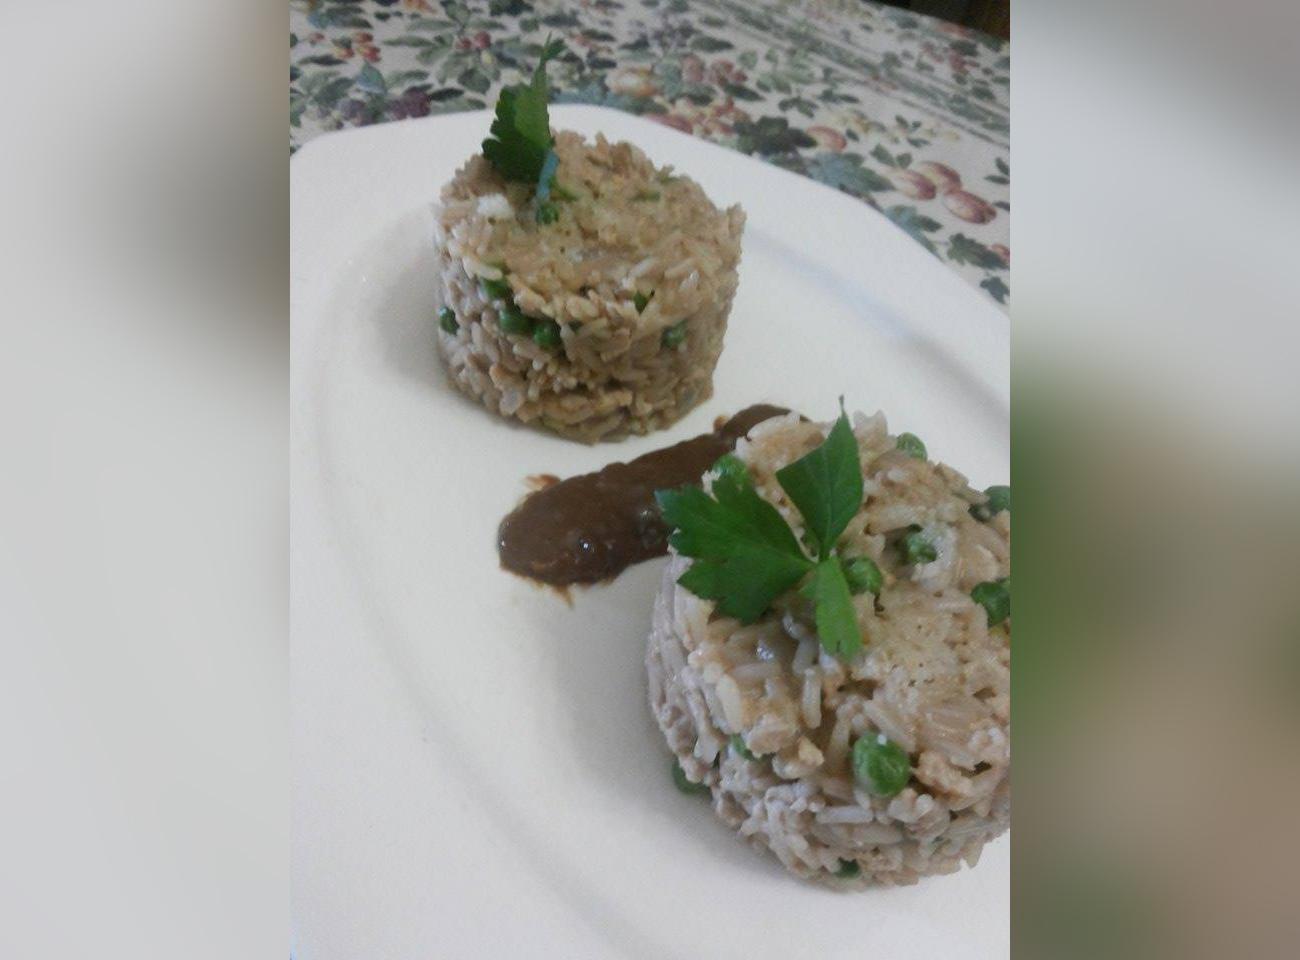 Chicken risotto with a salty rice & chocolate ganache by Kieran Micallef